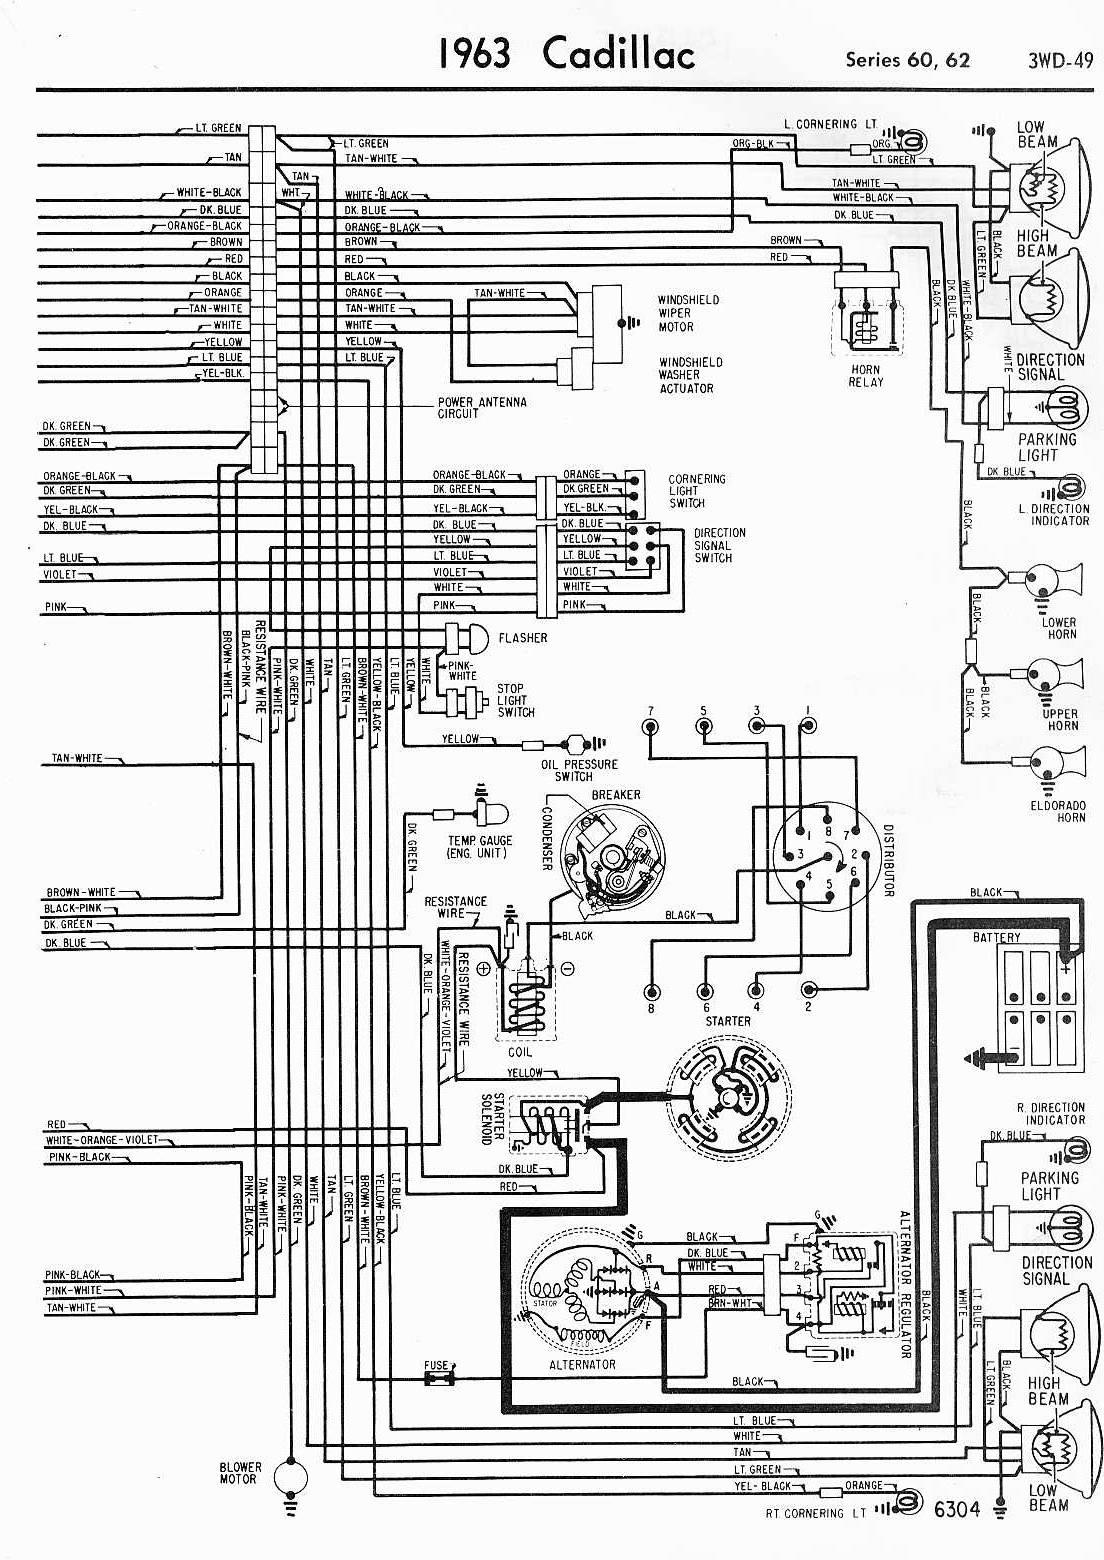 medium resolution of 1978 cadillac seville wiring diagrams wiring diagram general 1963 cadillac deville wire diagram iet mhcarsalederry uk